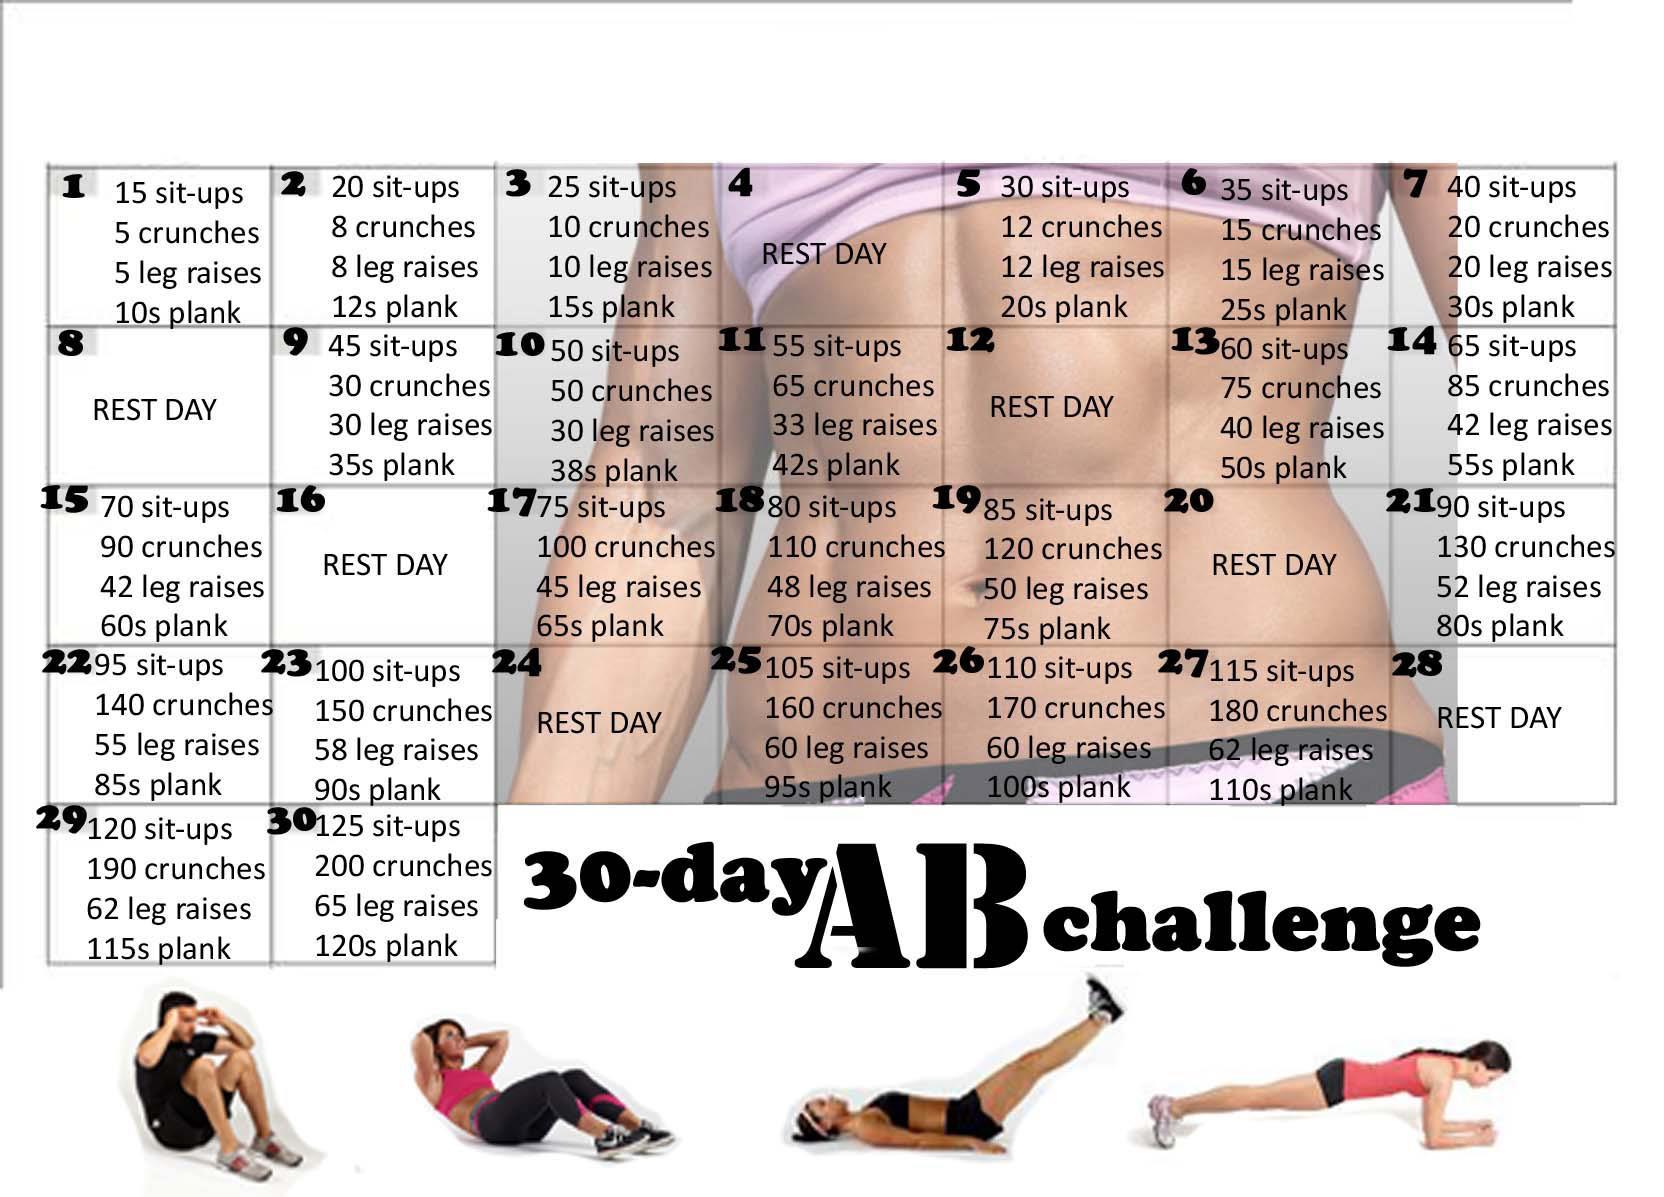 http://nsfitbitch.files.wordpress.com/2013/05/ab-challenge.jpg